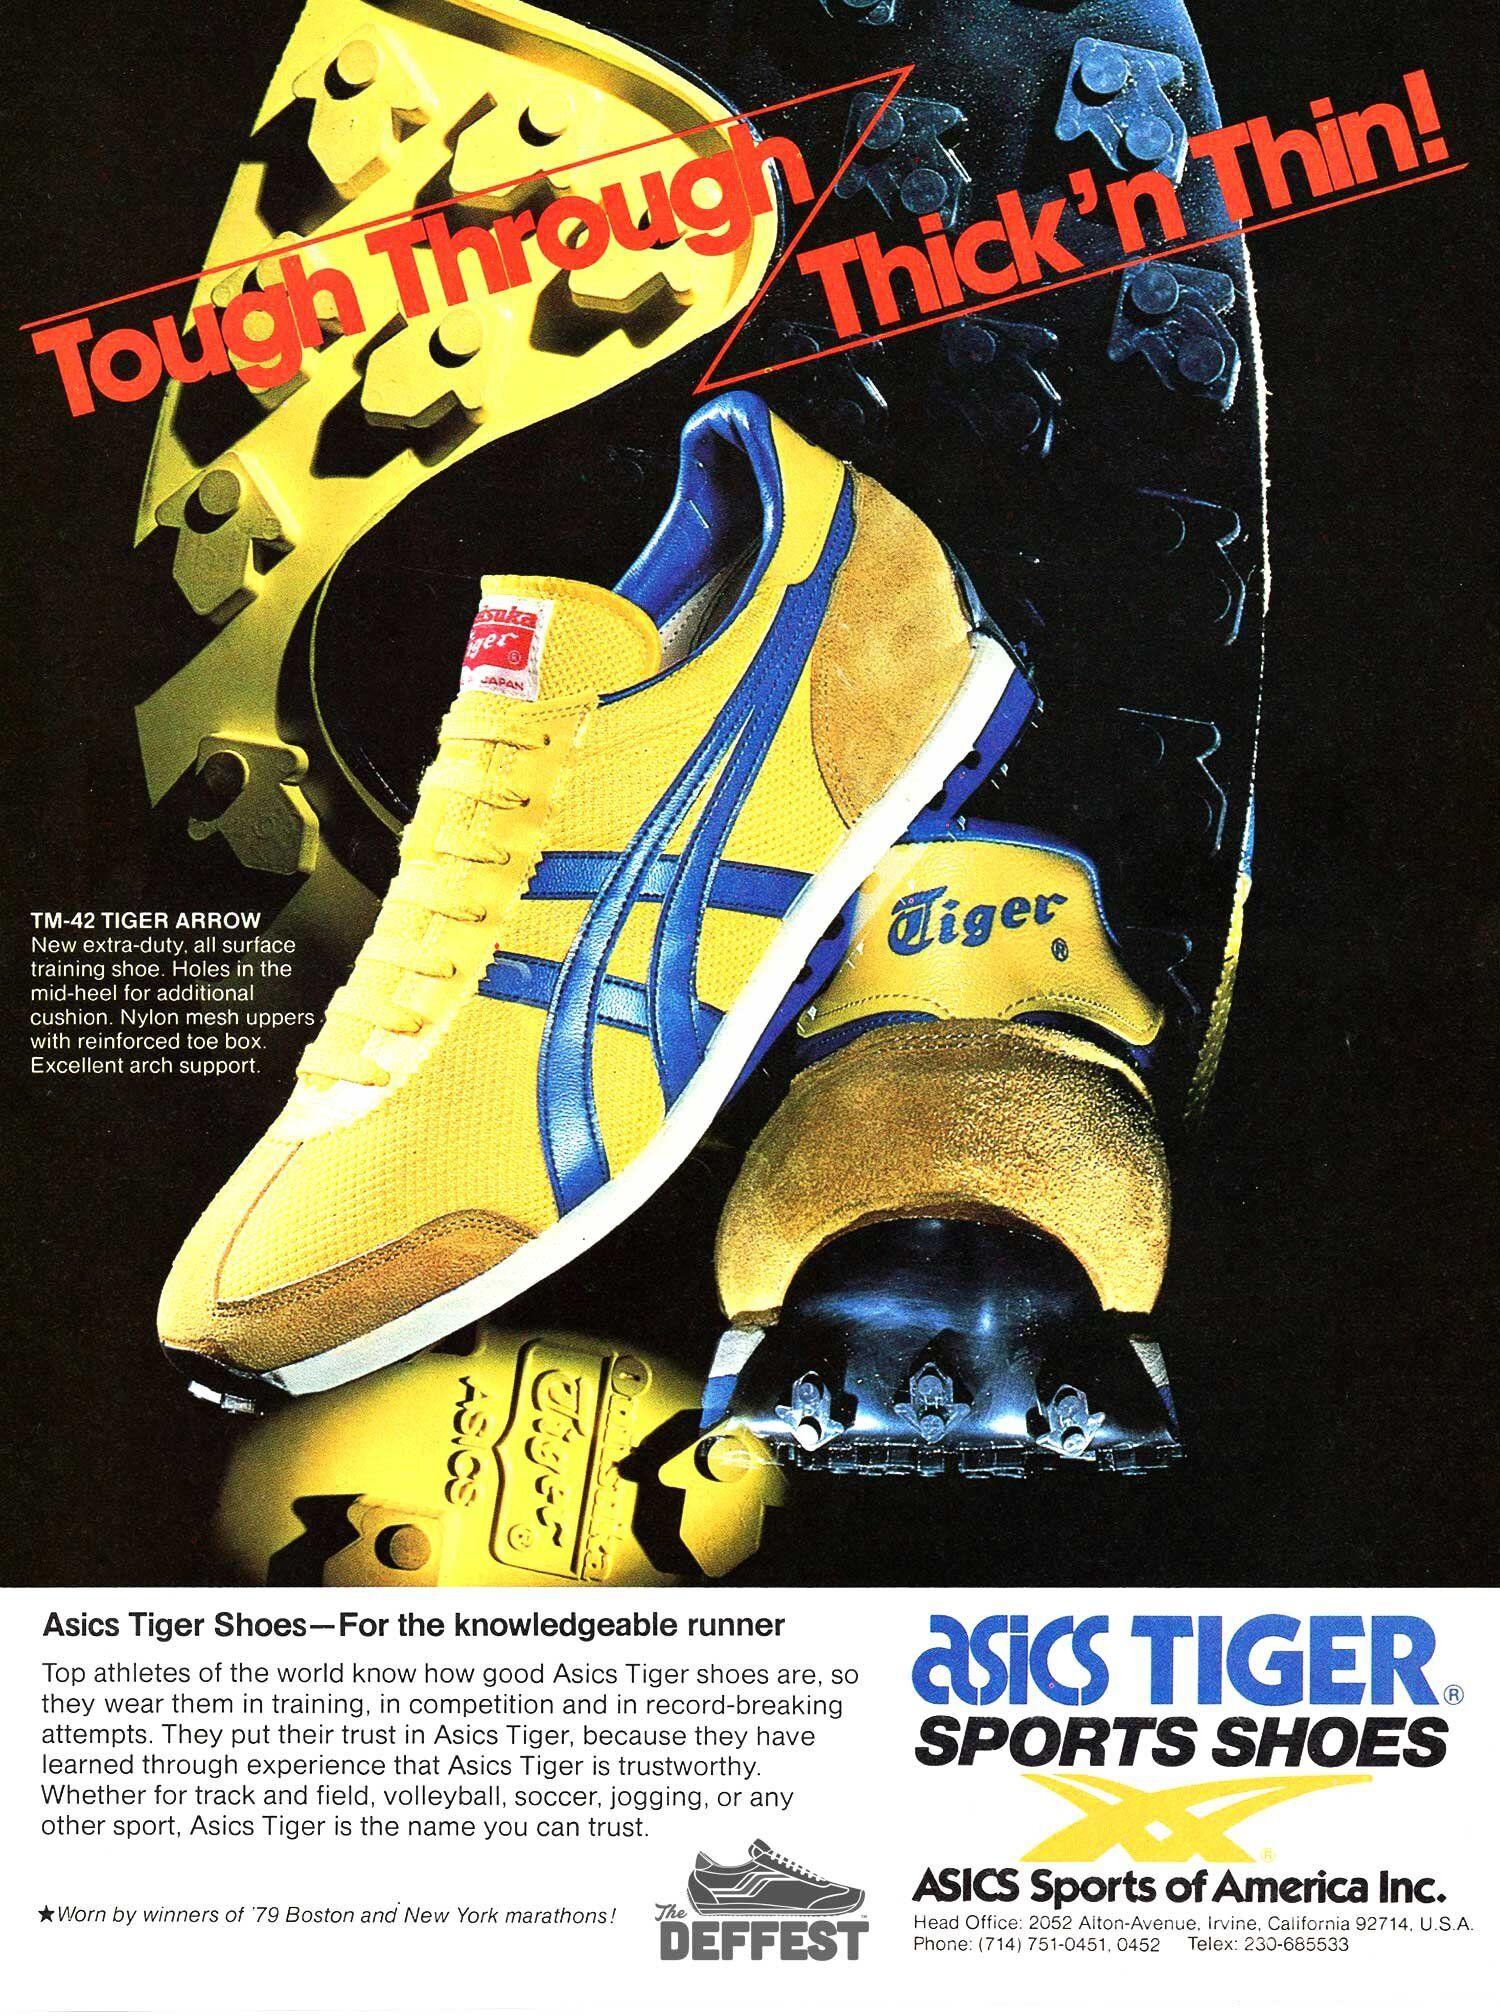 Asics Onitsuka Tiger TM-42 Arrow 1980